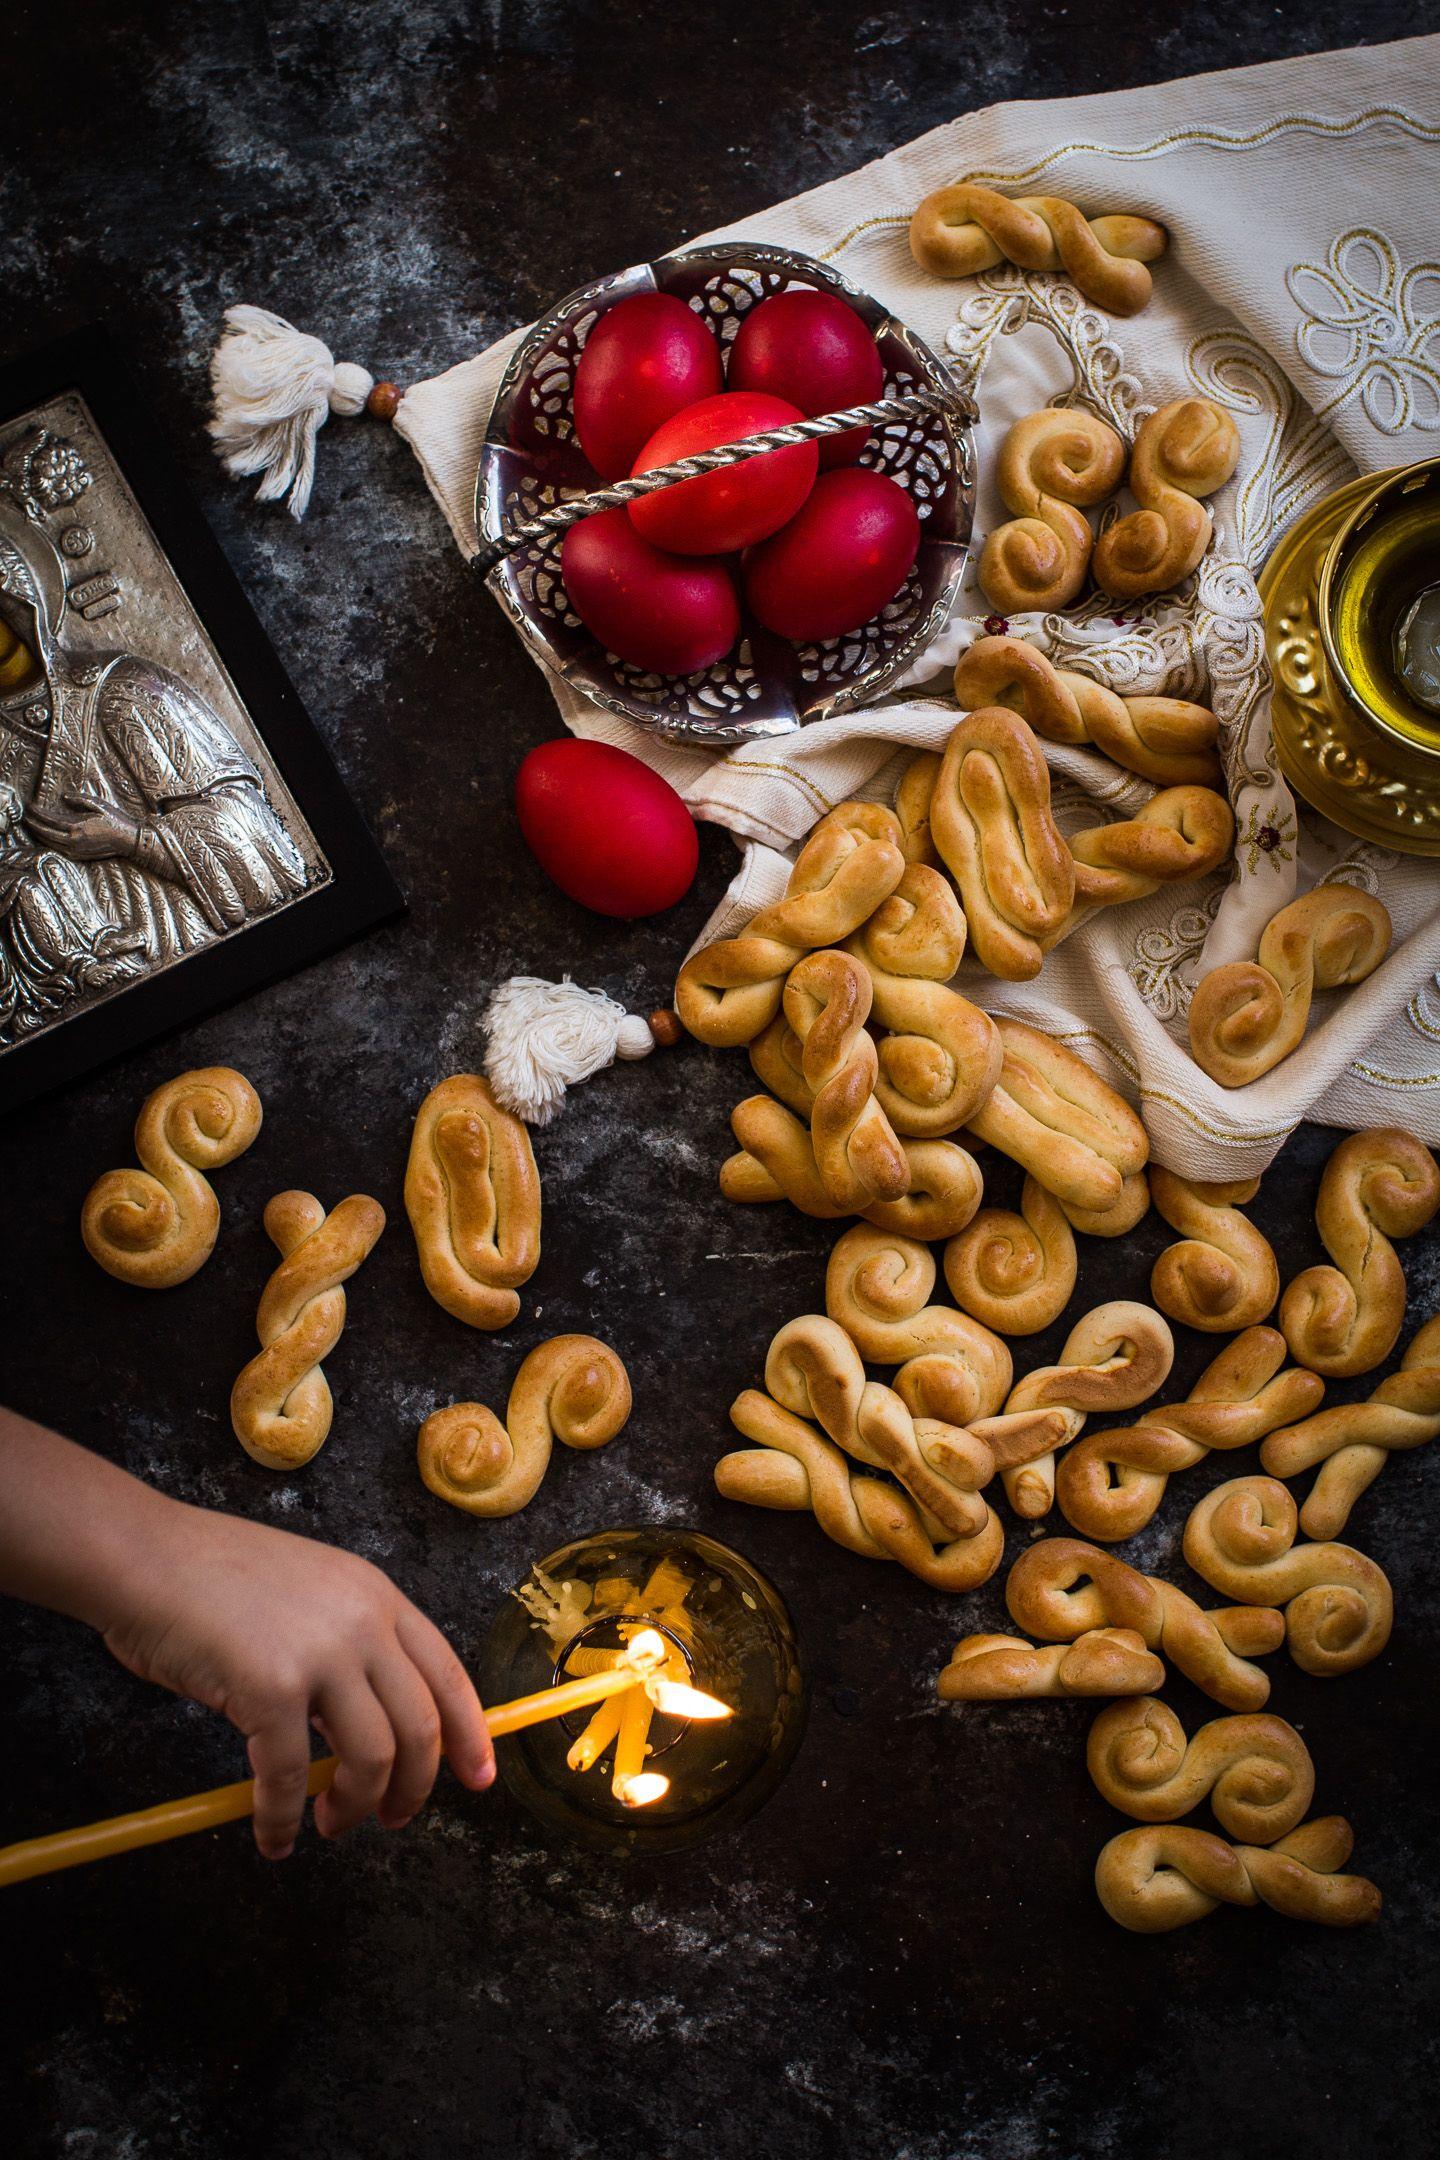 Greek Koulouria Gluten Free Recipe Helen Tzouganatos Gluten Free Recipes Recipe In 2020 Gluten Free Recipes Gluten Free Puff Pastry Moody Food Photography